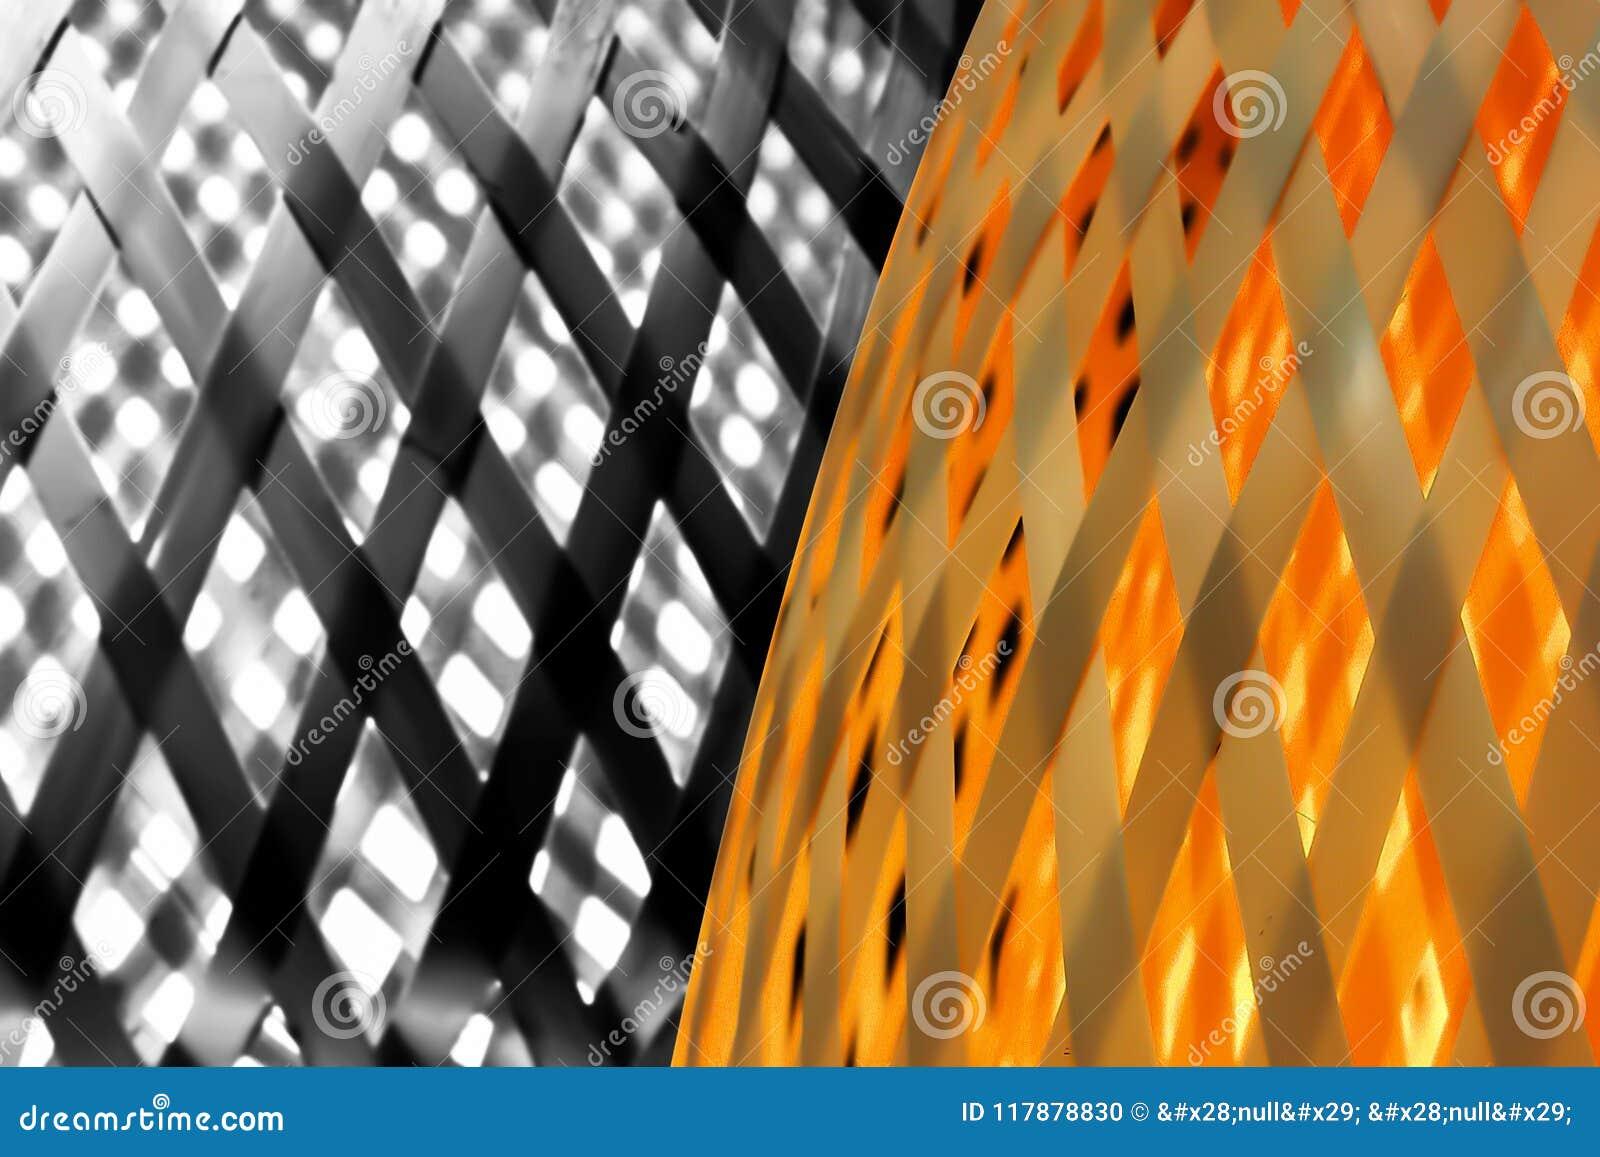 Closeup On Beautiful Art And Craft Of Wood Lattice Stock Photo